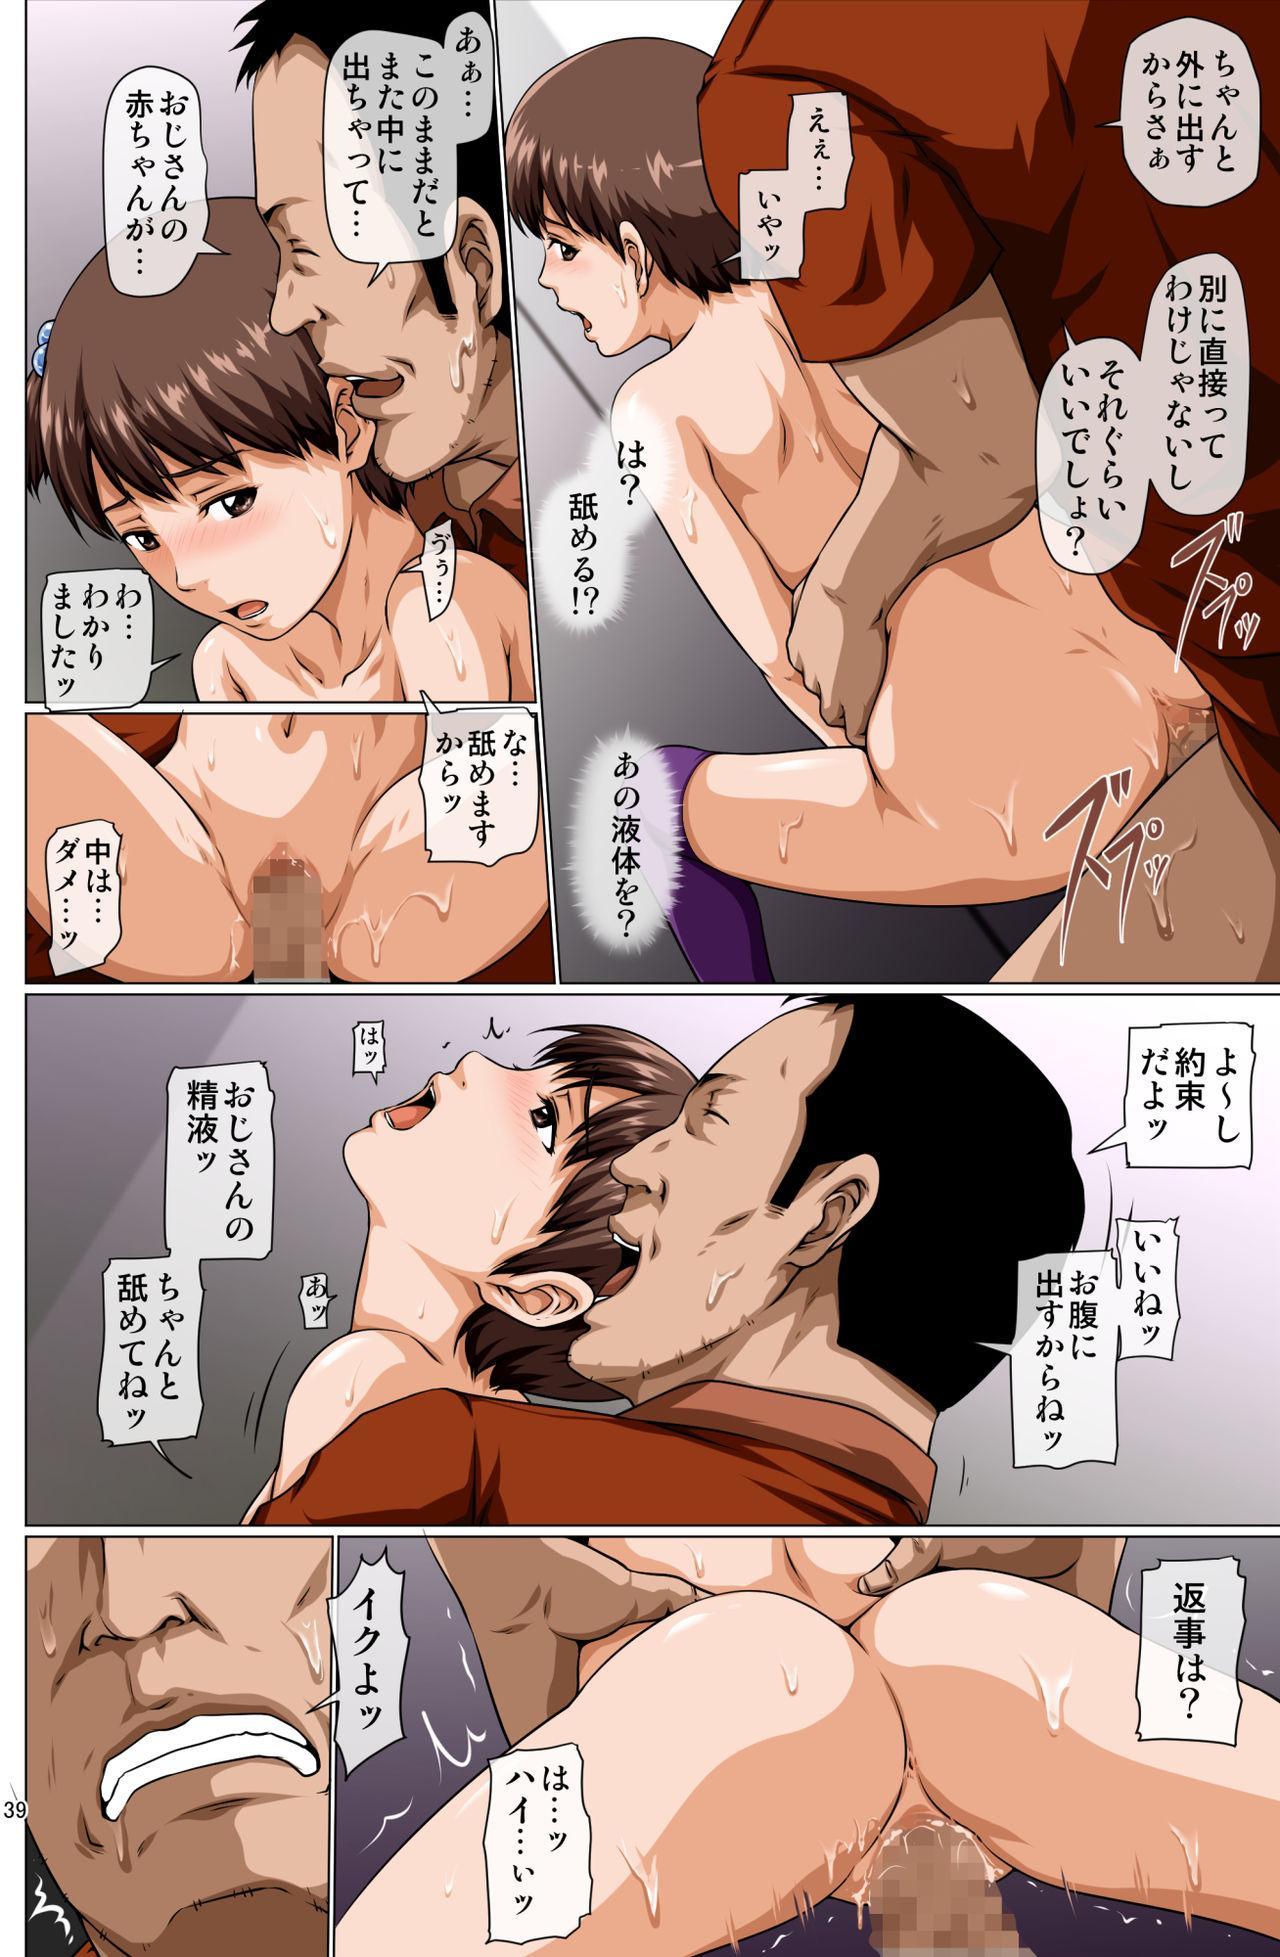 Chikan Mashimaro 38